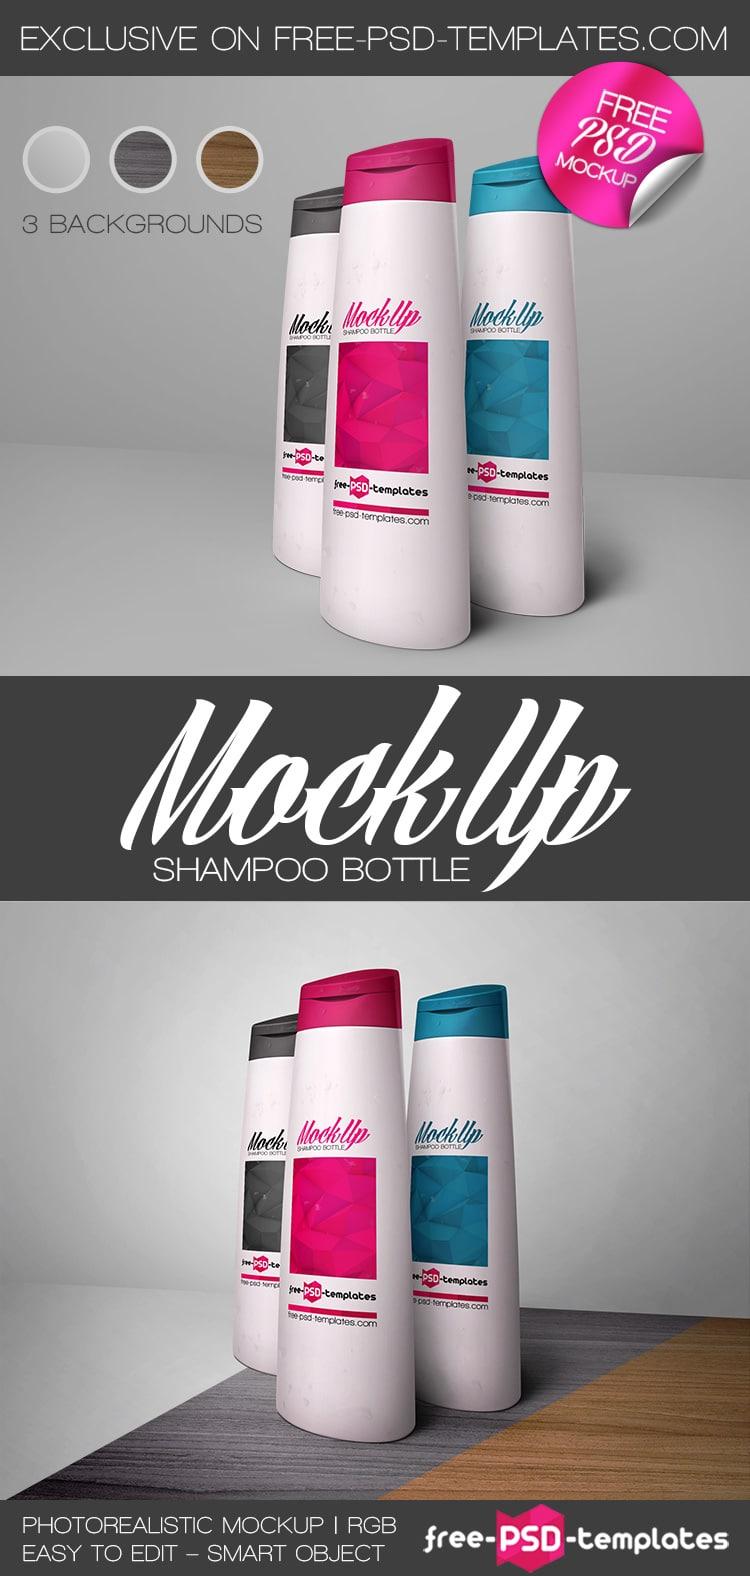 Shampoo Bottle Design